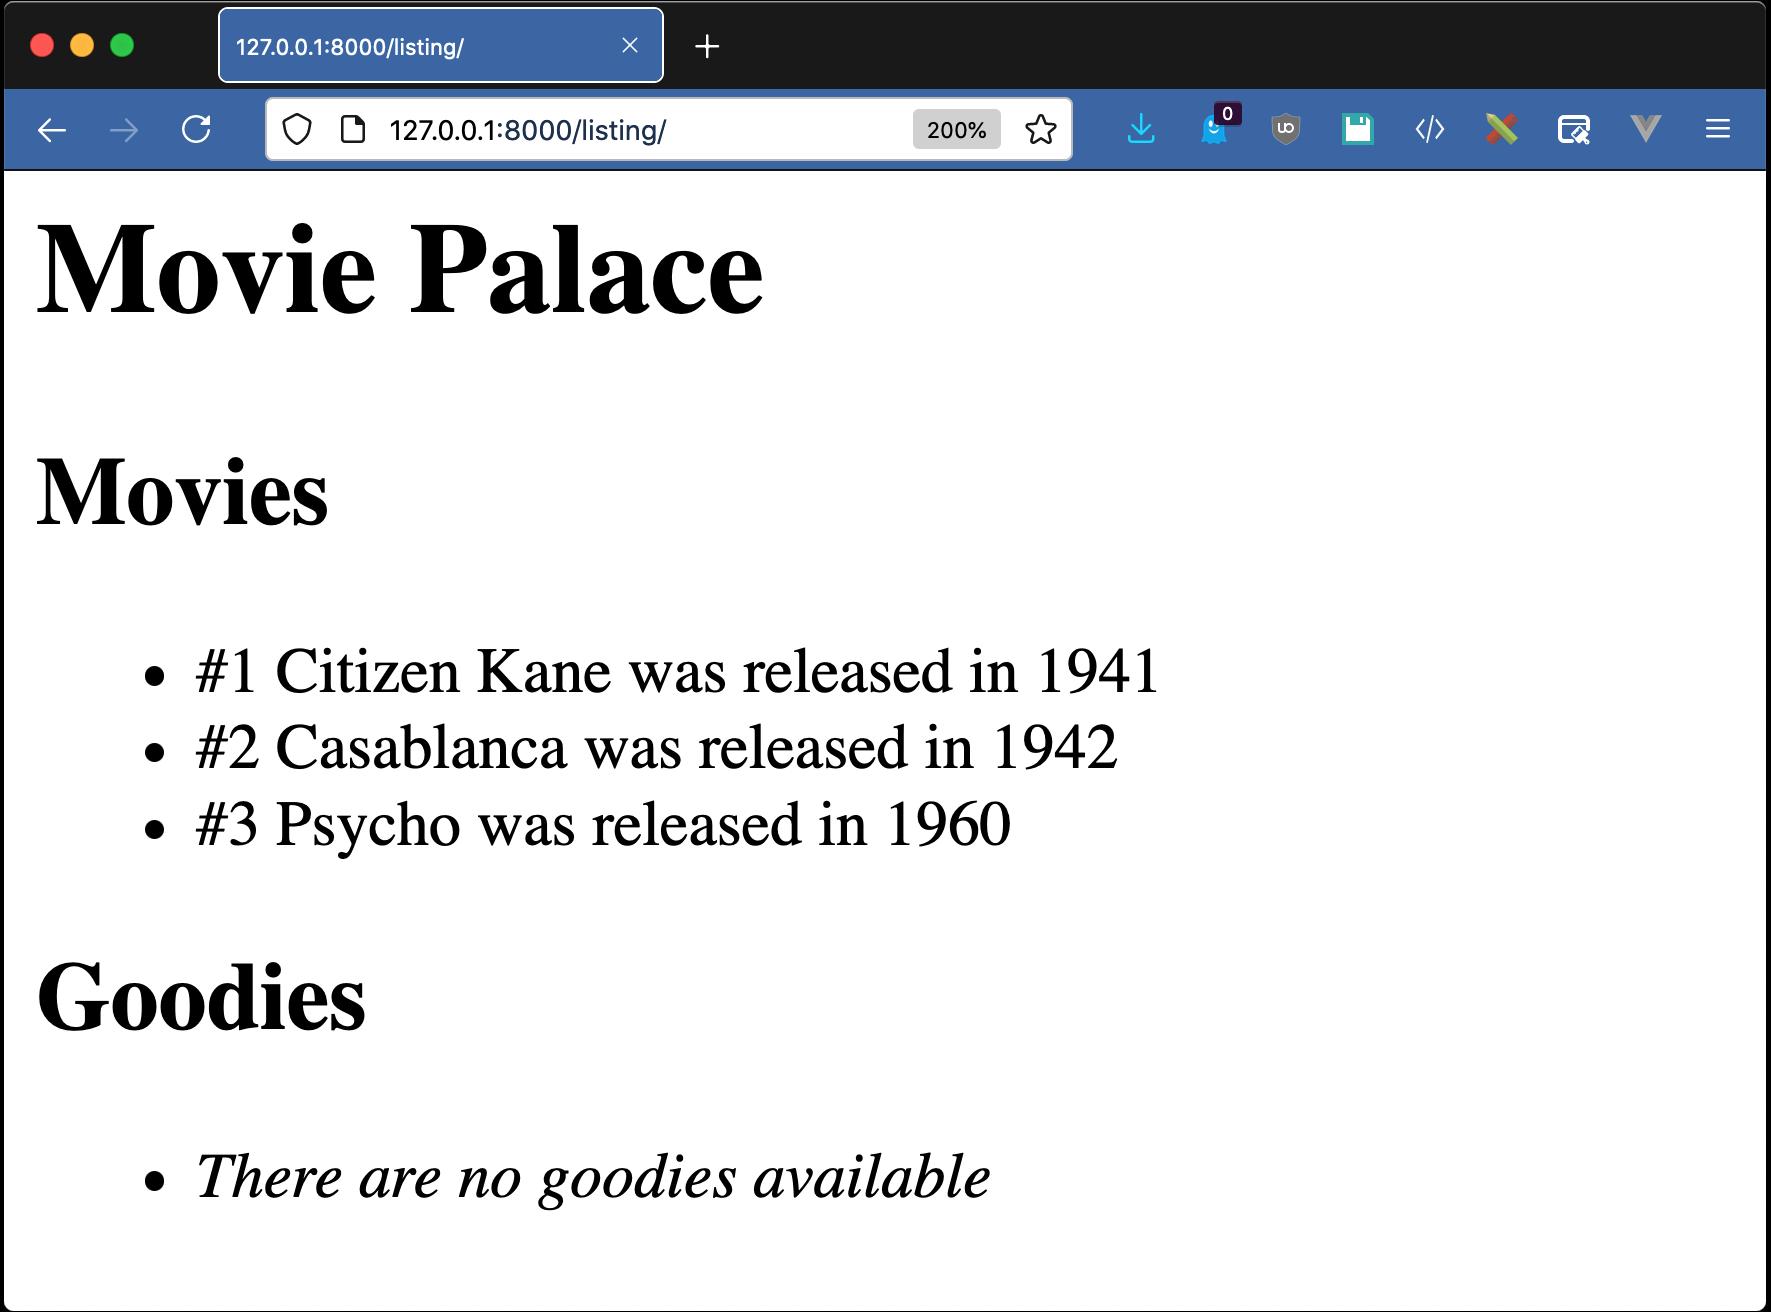 Django templates example, MoviePalace listing